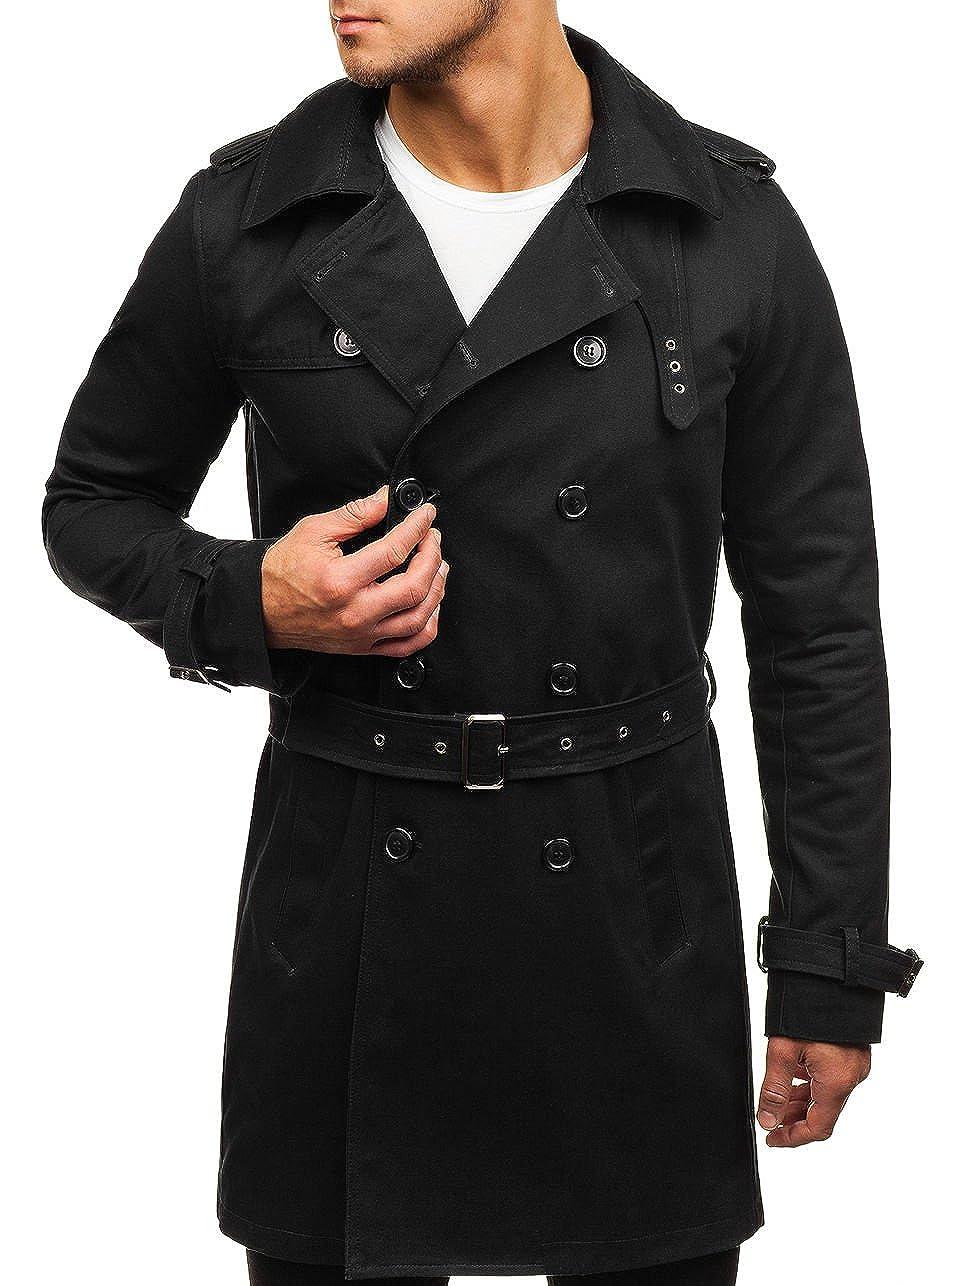 BOLF Herren Mantel Trenchcoat mit Gürtel Business Elegant Täglicher Stil 4D4 NATURE 5110